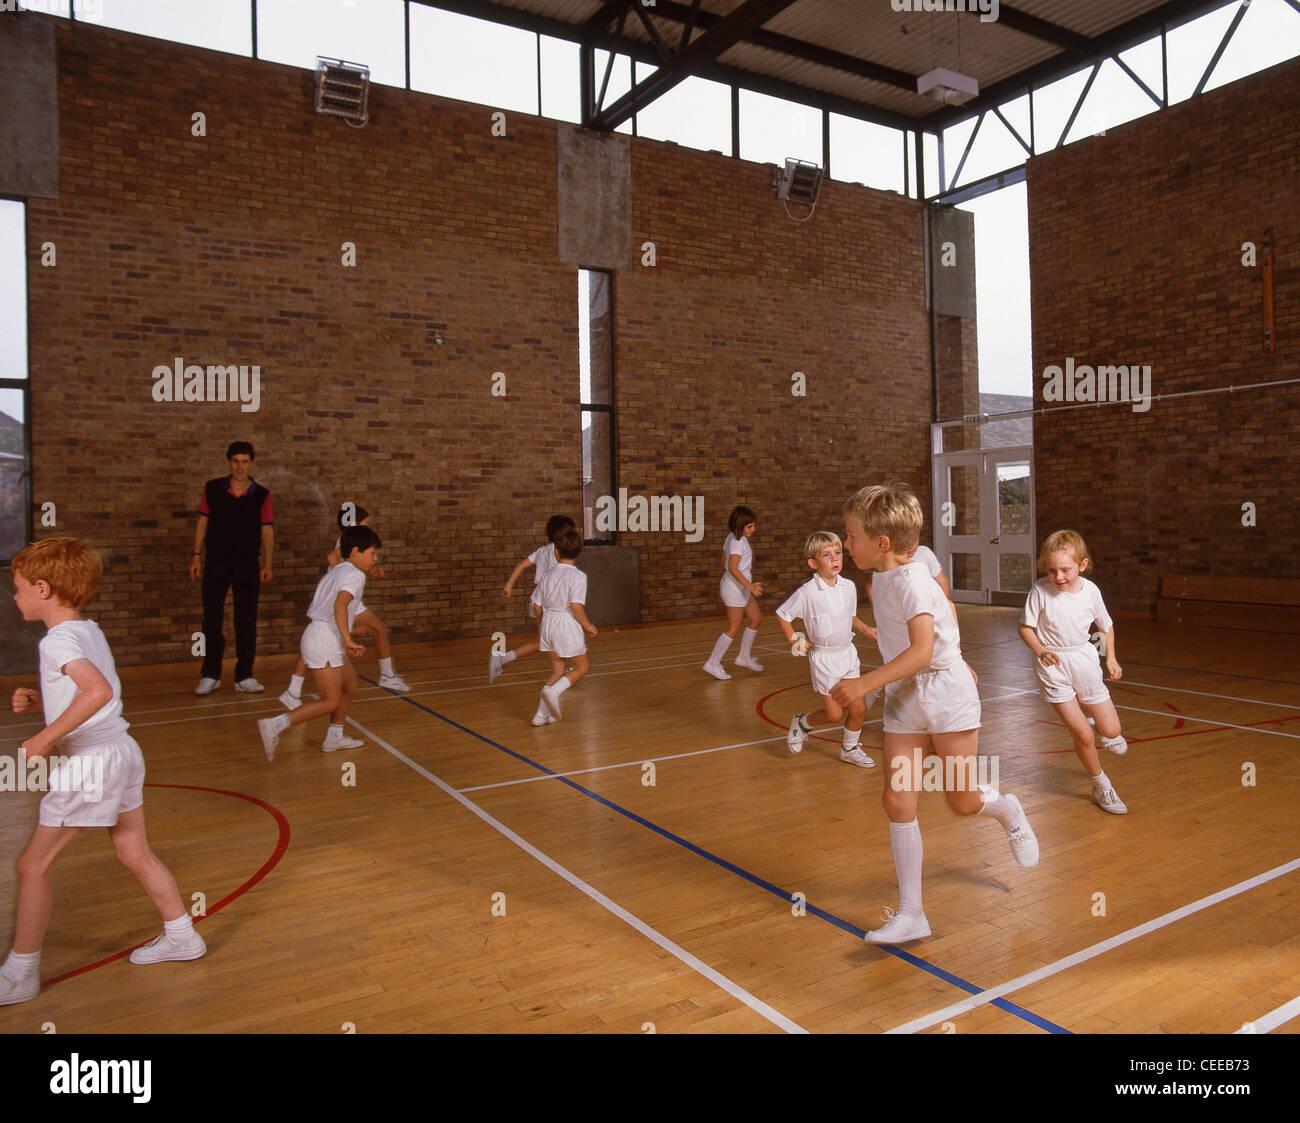 School children excercising in gym, Surrey, England, United Kingdom - Stock Image